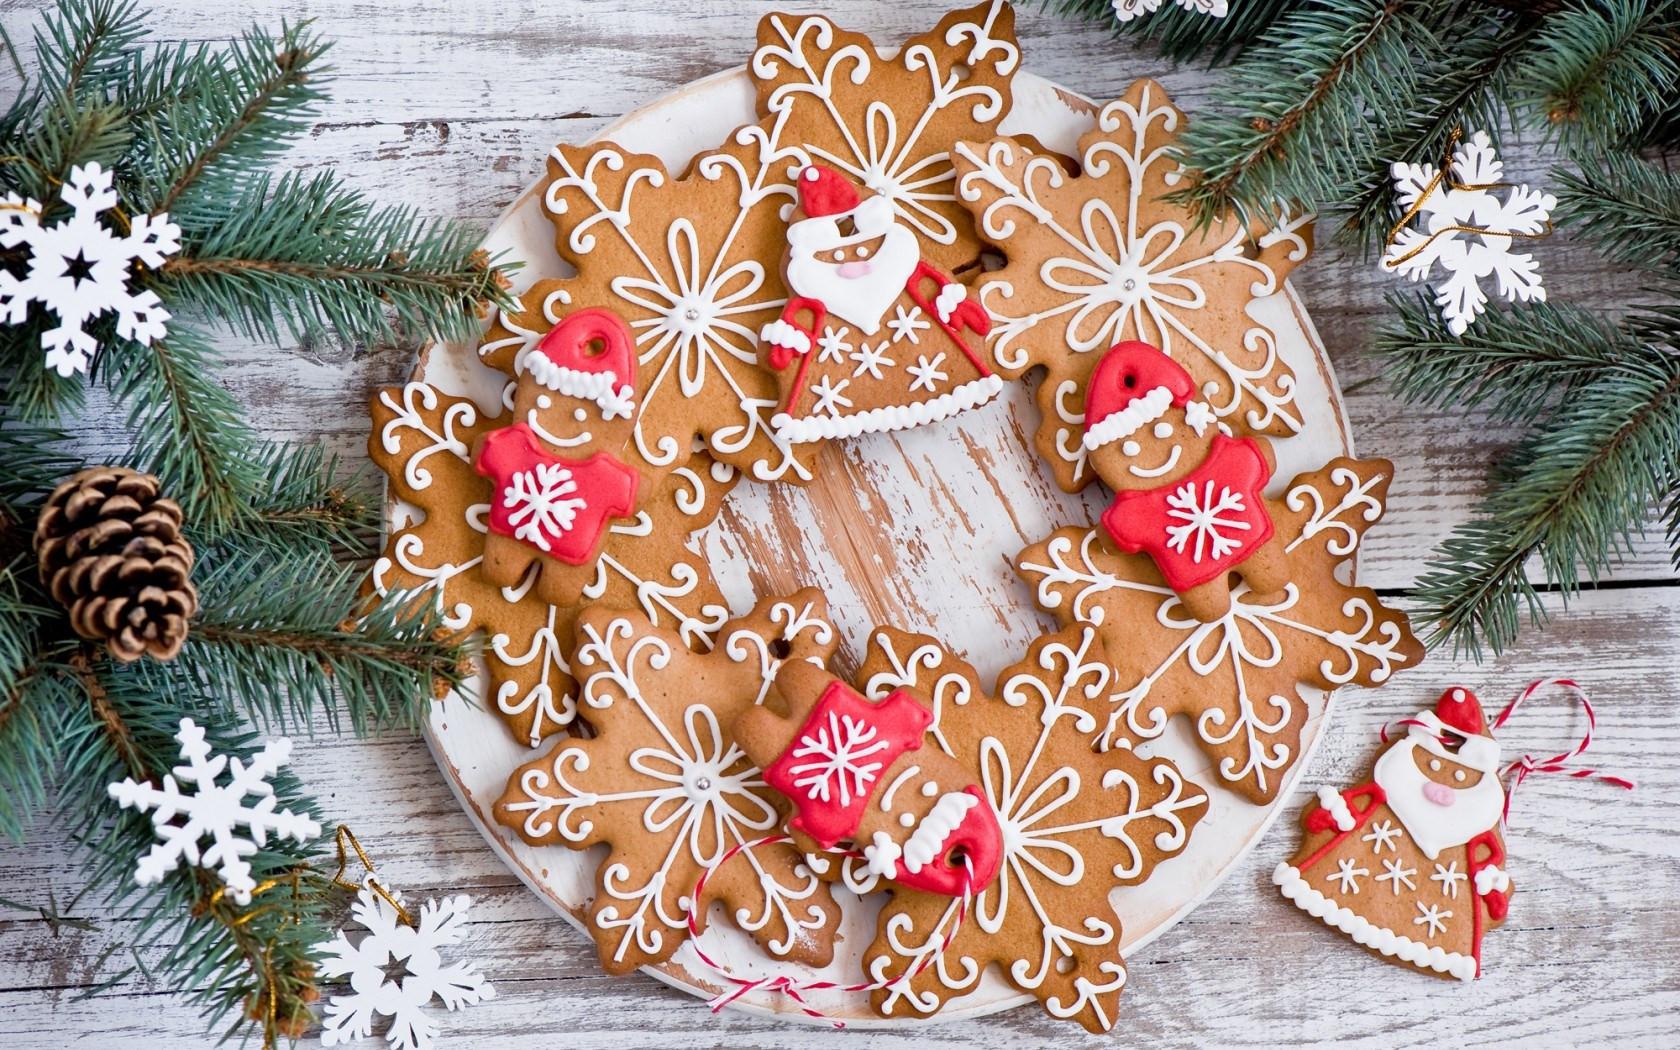 Christmas Cookies Wallpaper  merry christmas wallpapers dessert HD Desktop Wallpapers